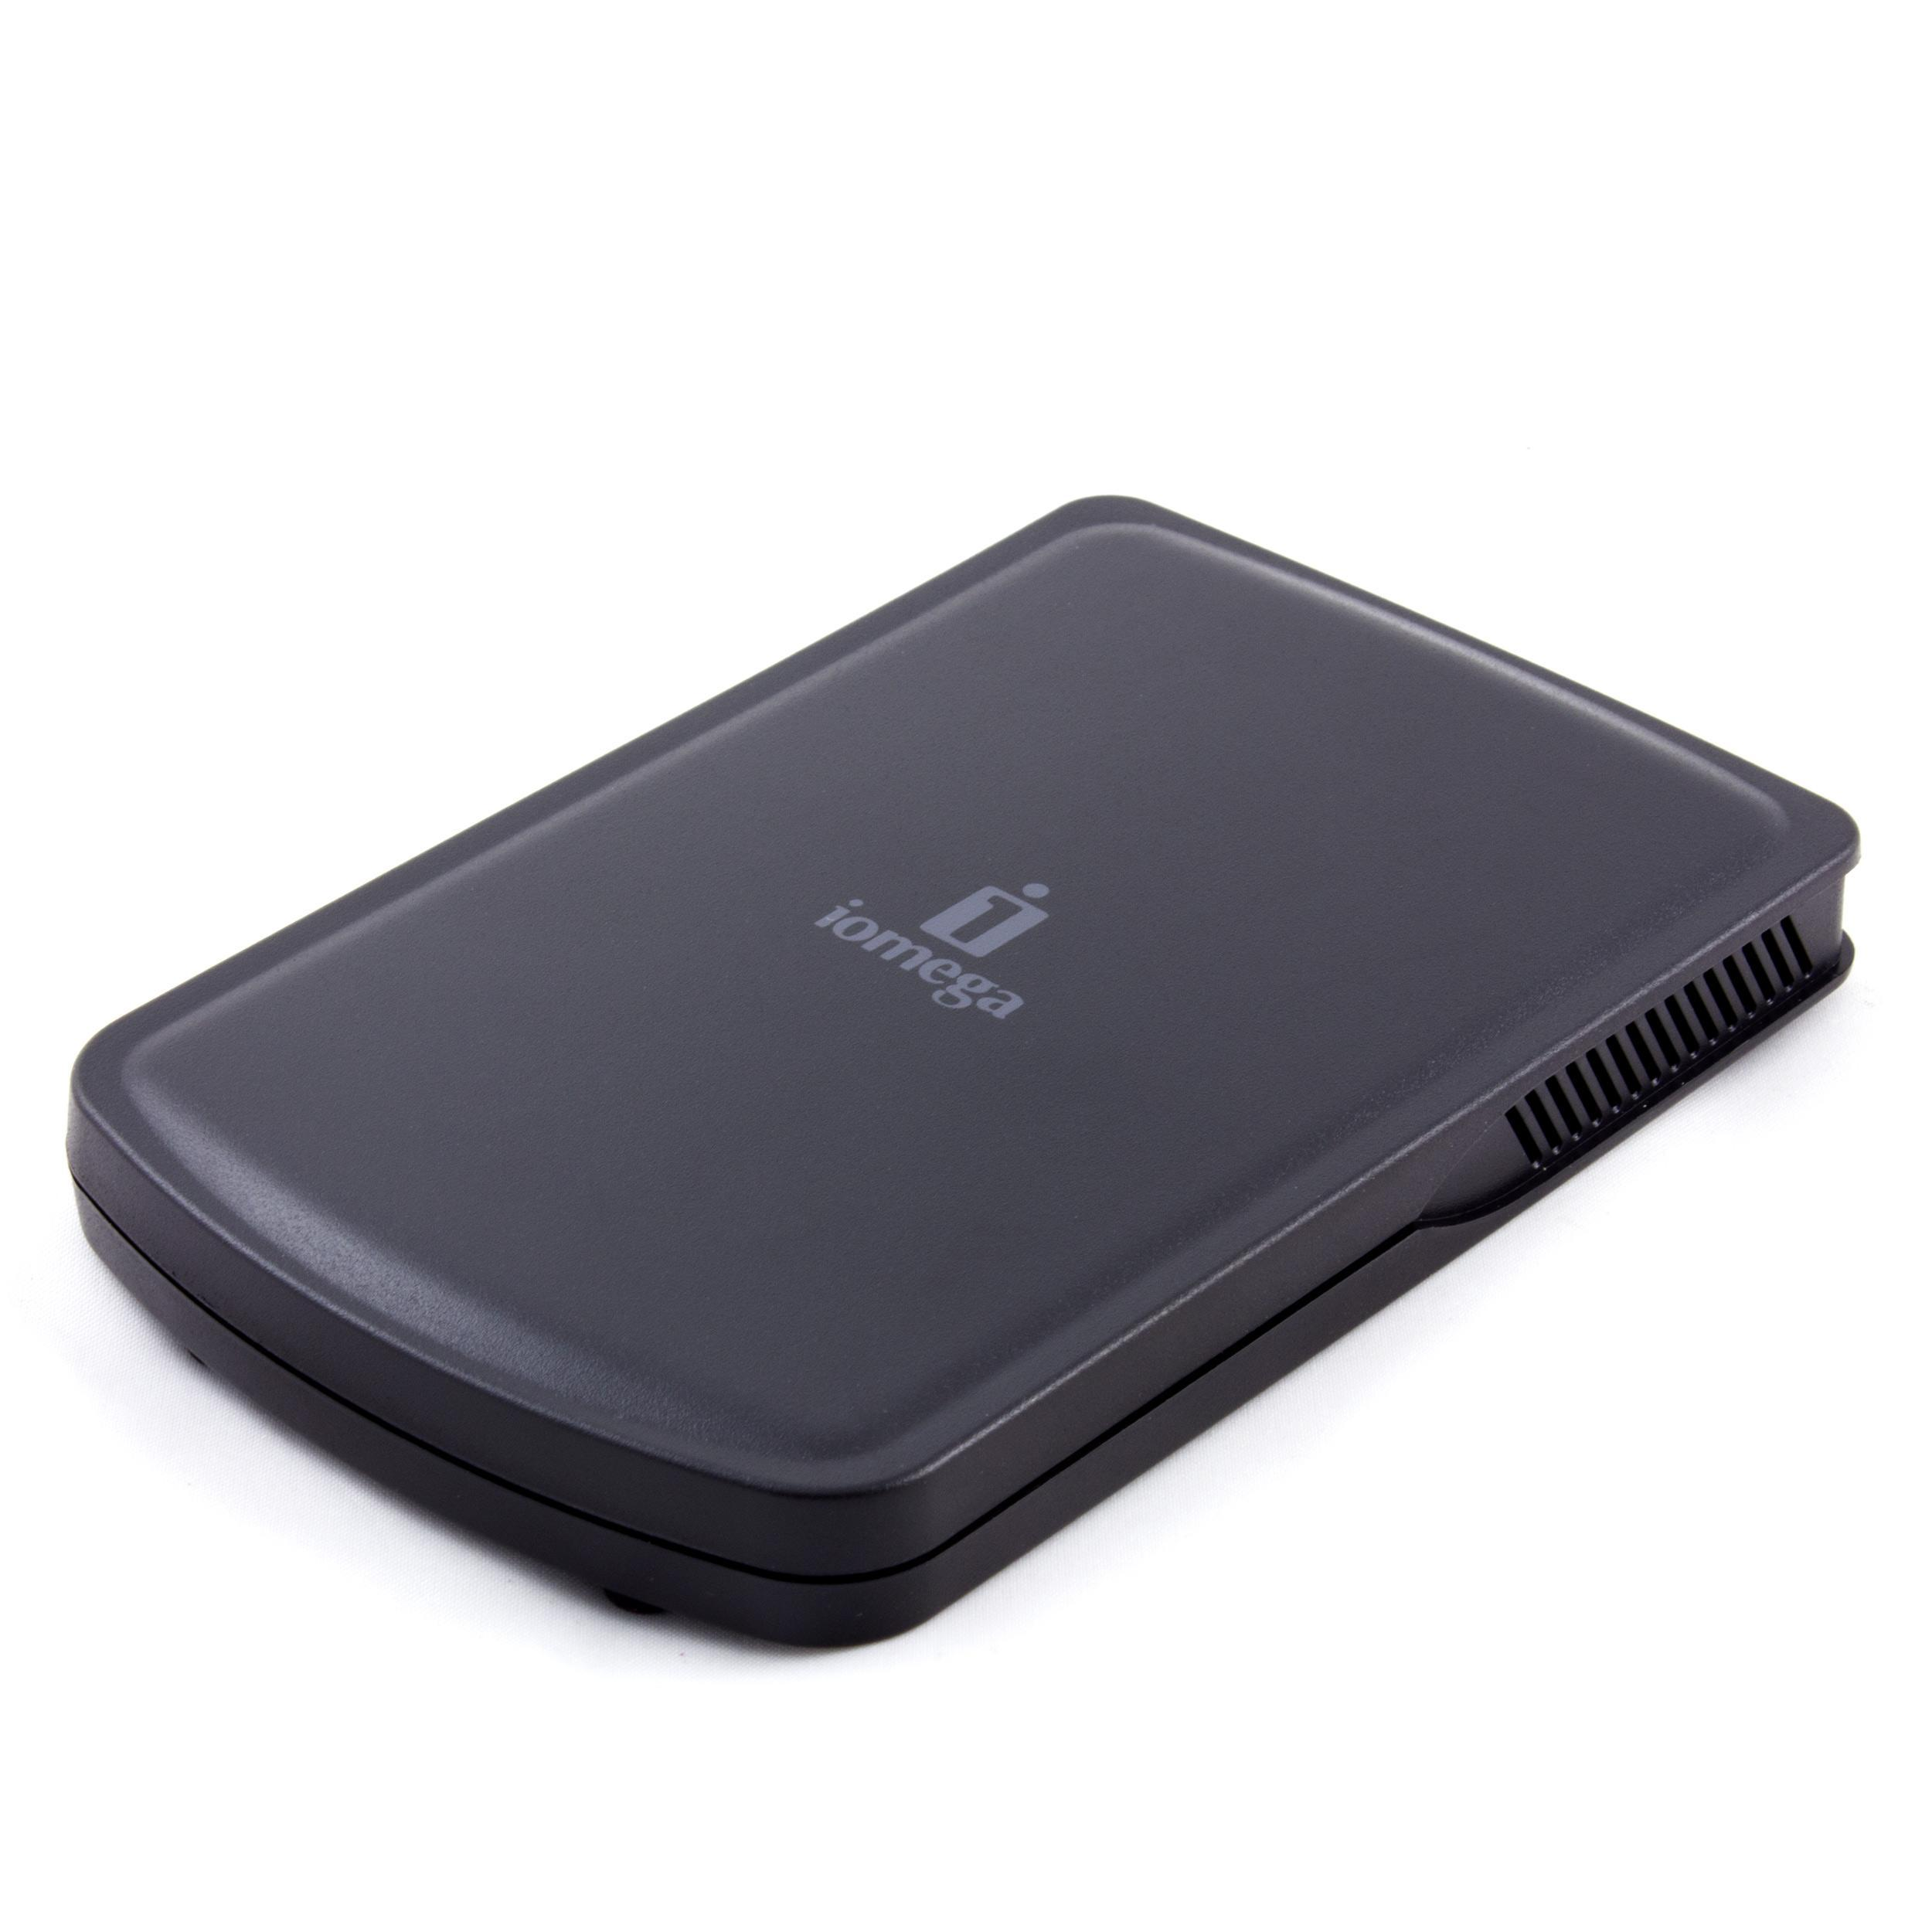 Iomega Select - Disque dur externe portable 2,5'' USB 2.0 320 Go